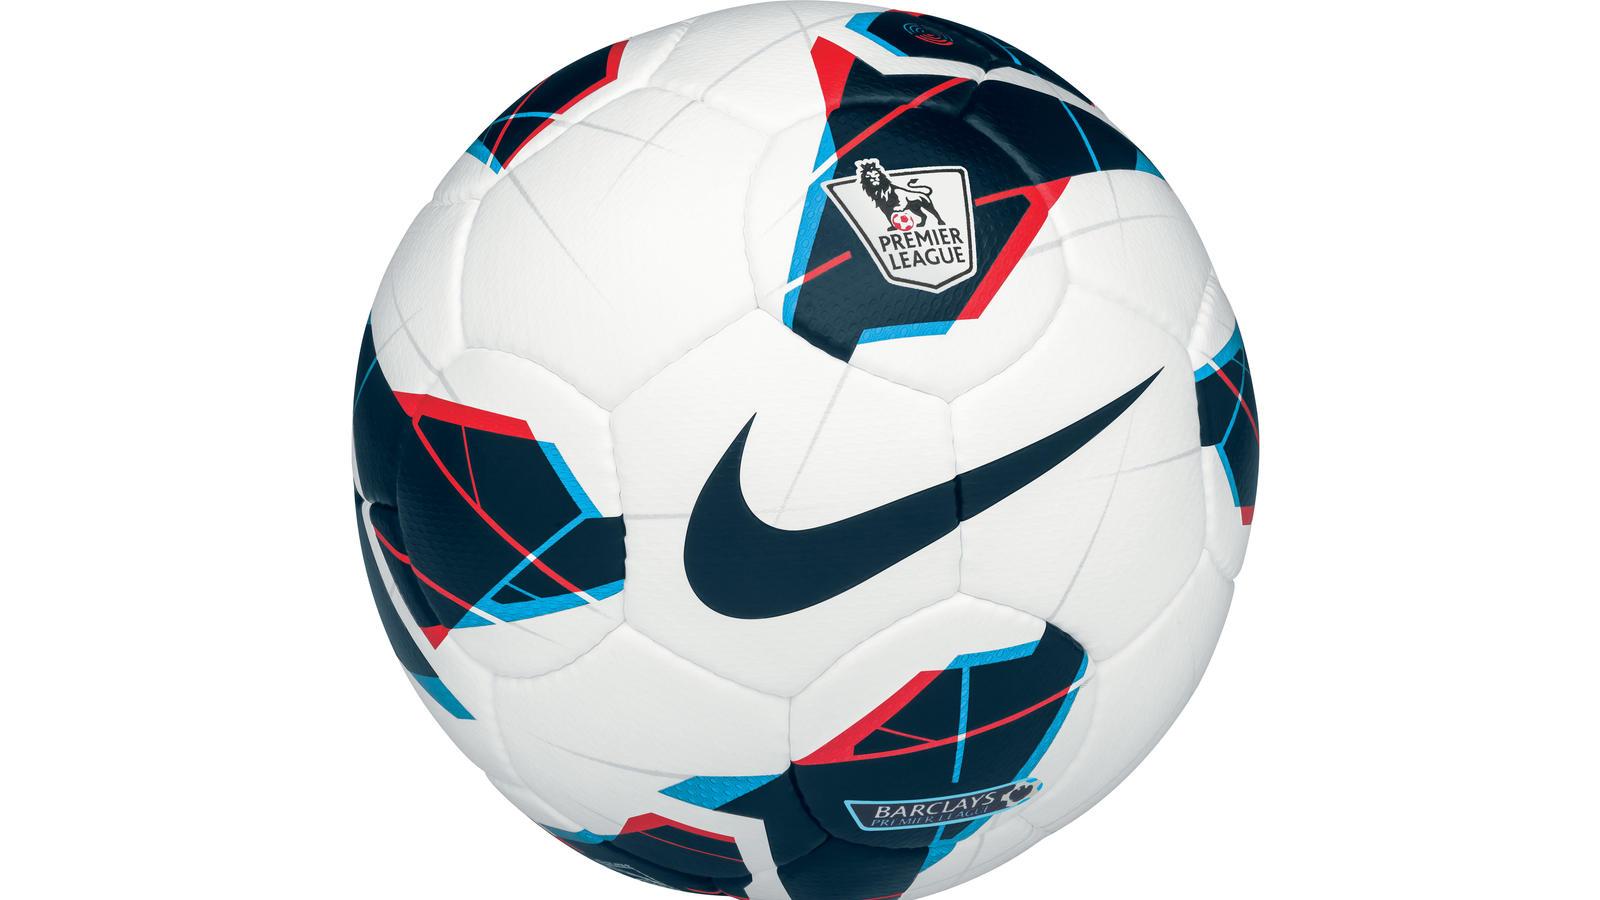 manzana escribir Reafirmar  Nike Renews Premier League Partnership Through 2018-19 Season - Nike News